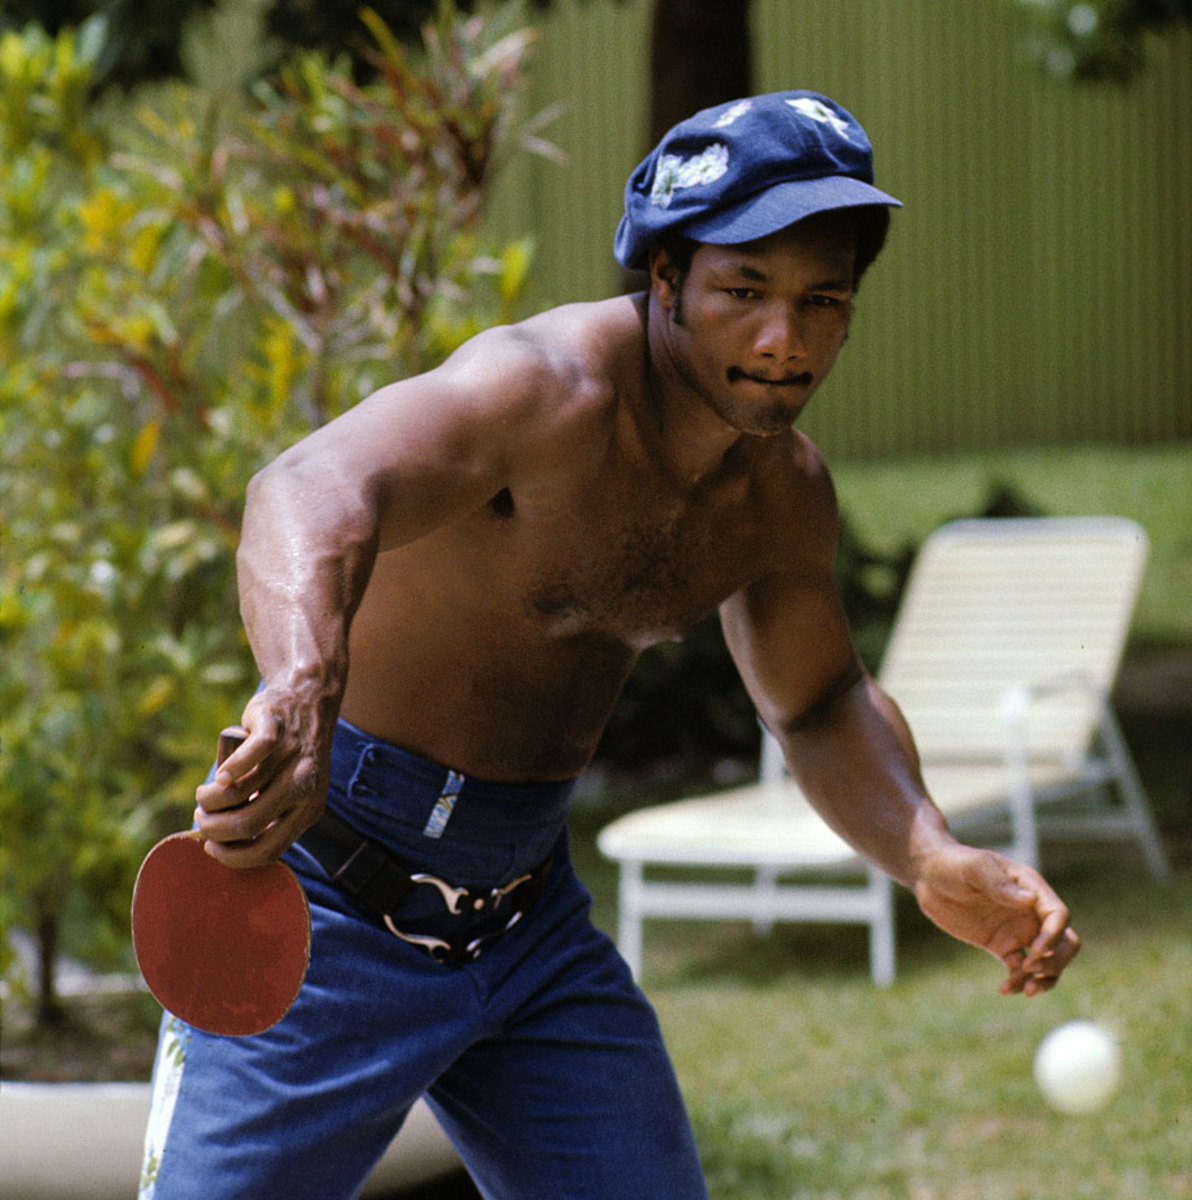 1974-george-foreman-ping-pong-079008630.jpg